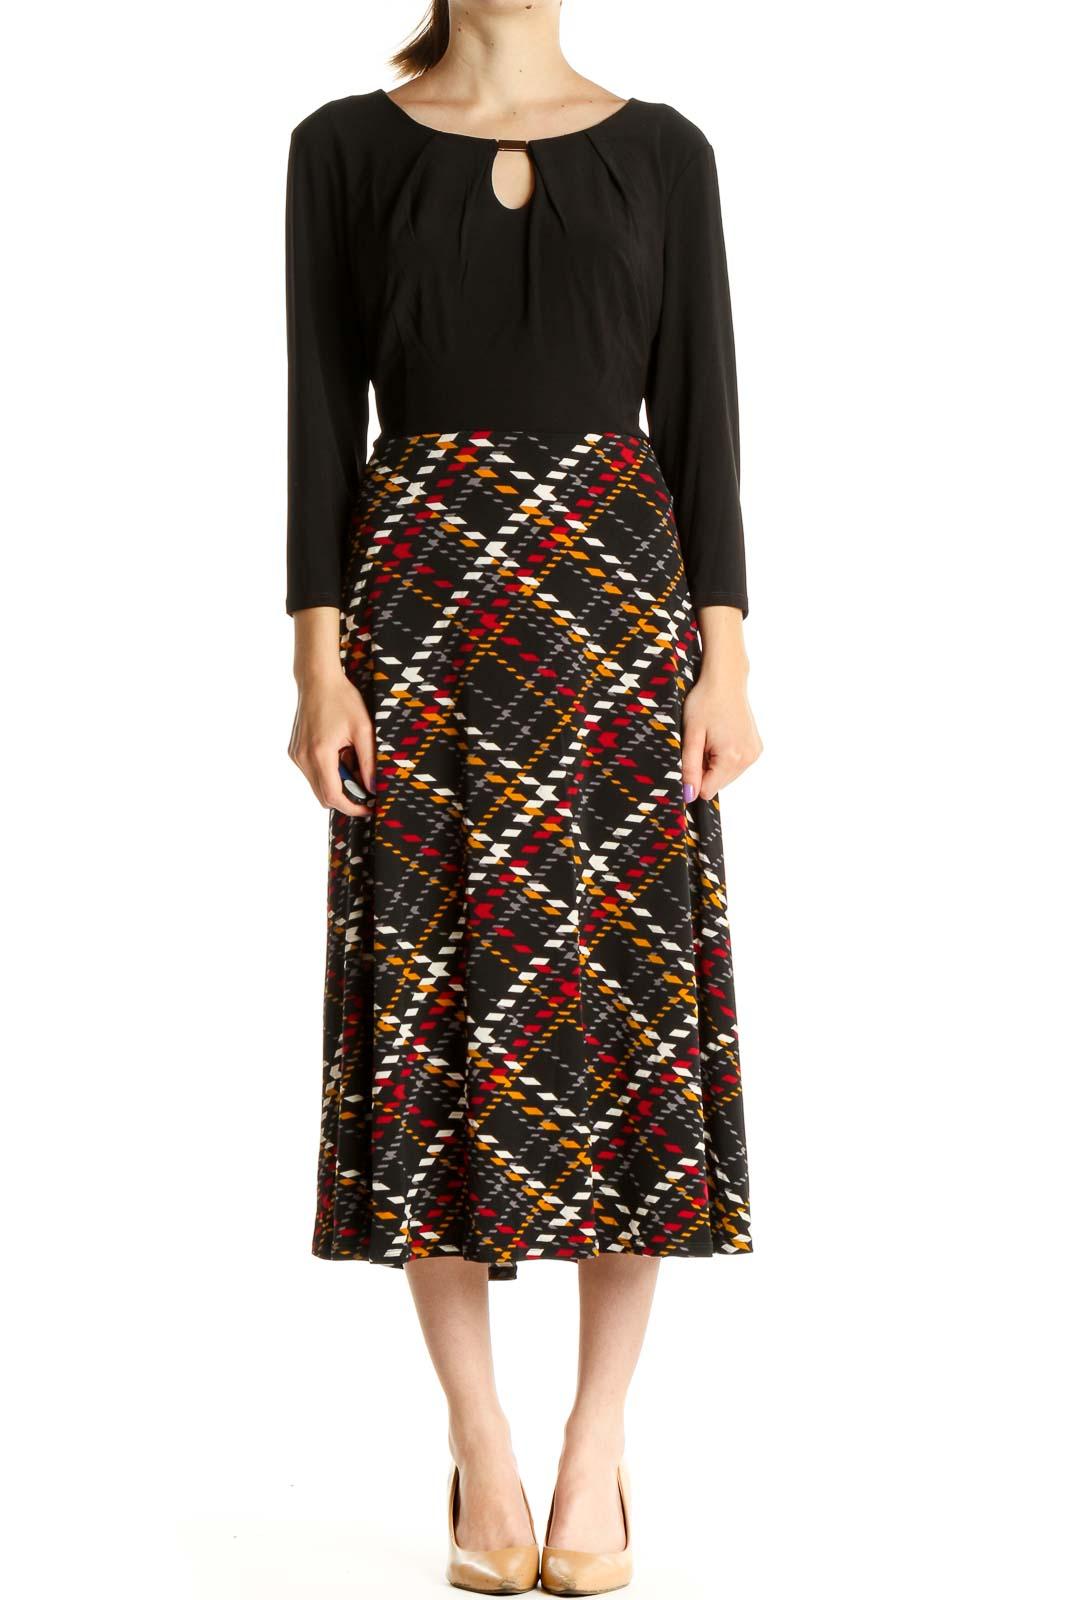 Black Printed Sheath Dress Front